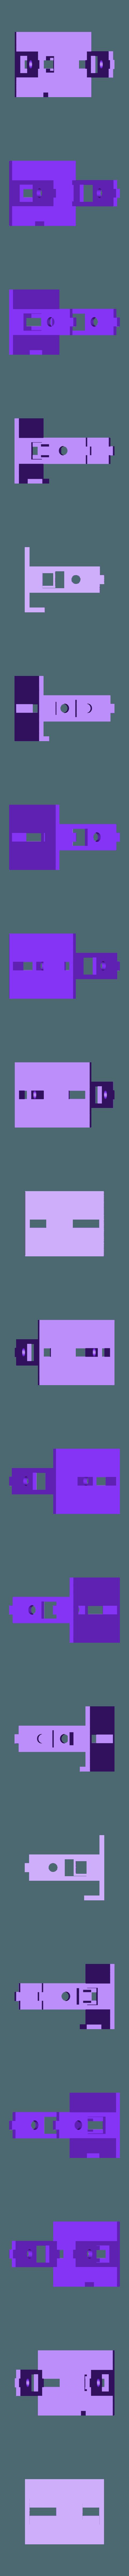 Base.stl Download free STL file PLA Kissing Couple • Design to 3D print, gzumwalt